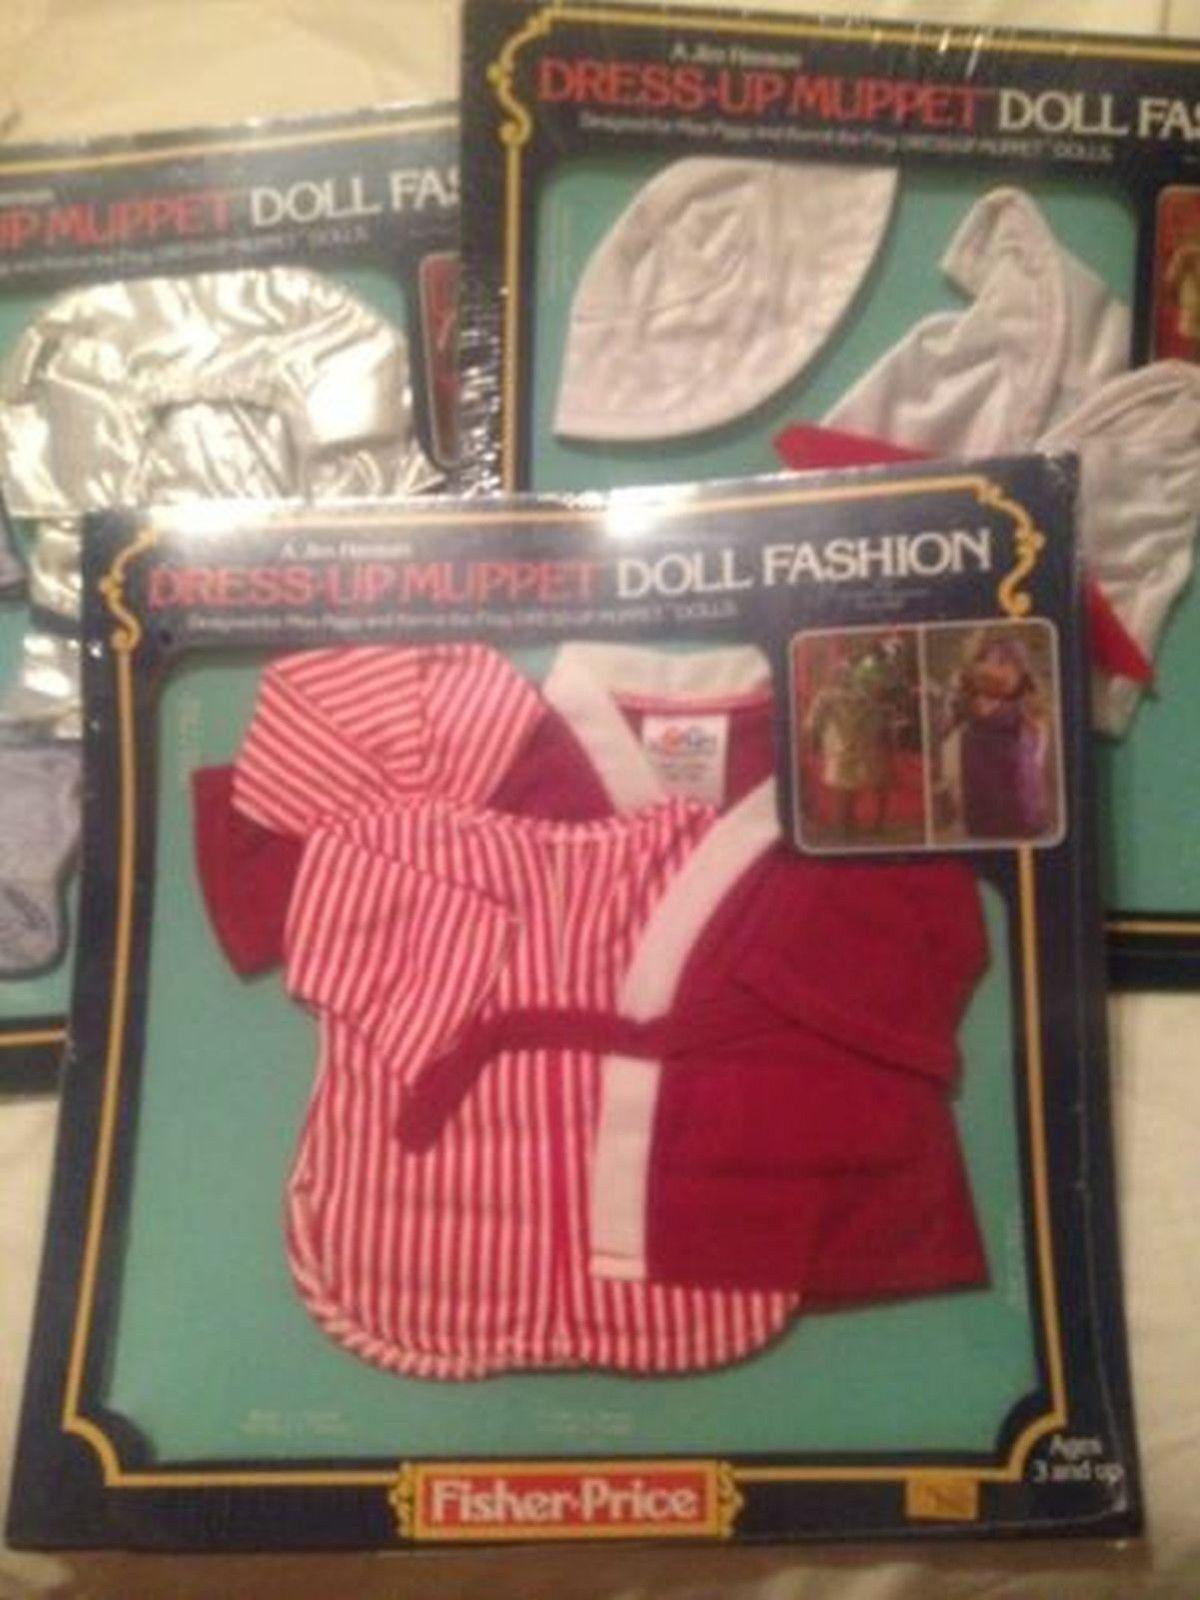 Lot Dress Up Muppet Doll Fashion Kermit Sleepwear Miss Piggy's Pigs Space Sailor